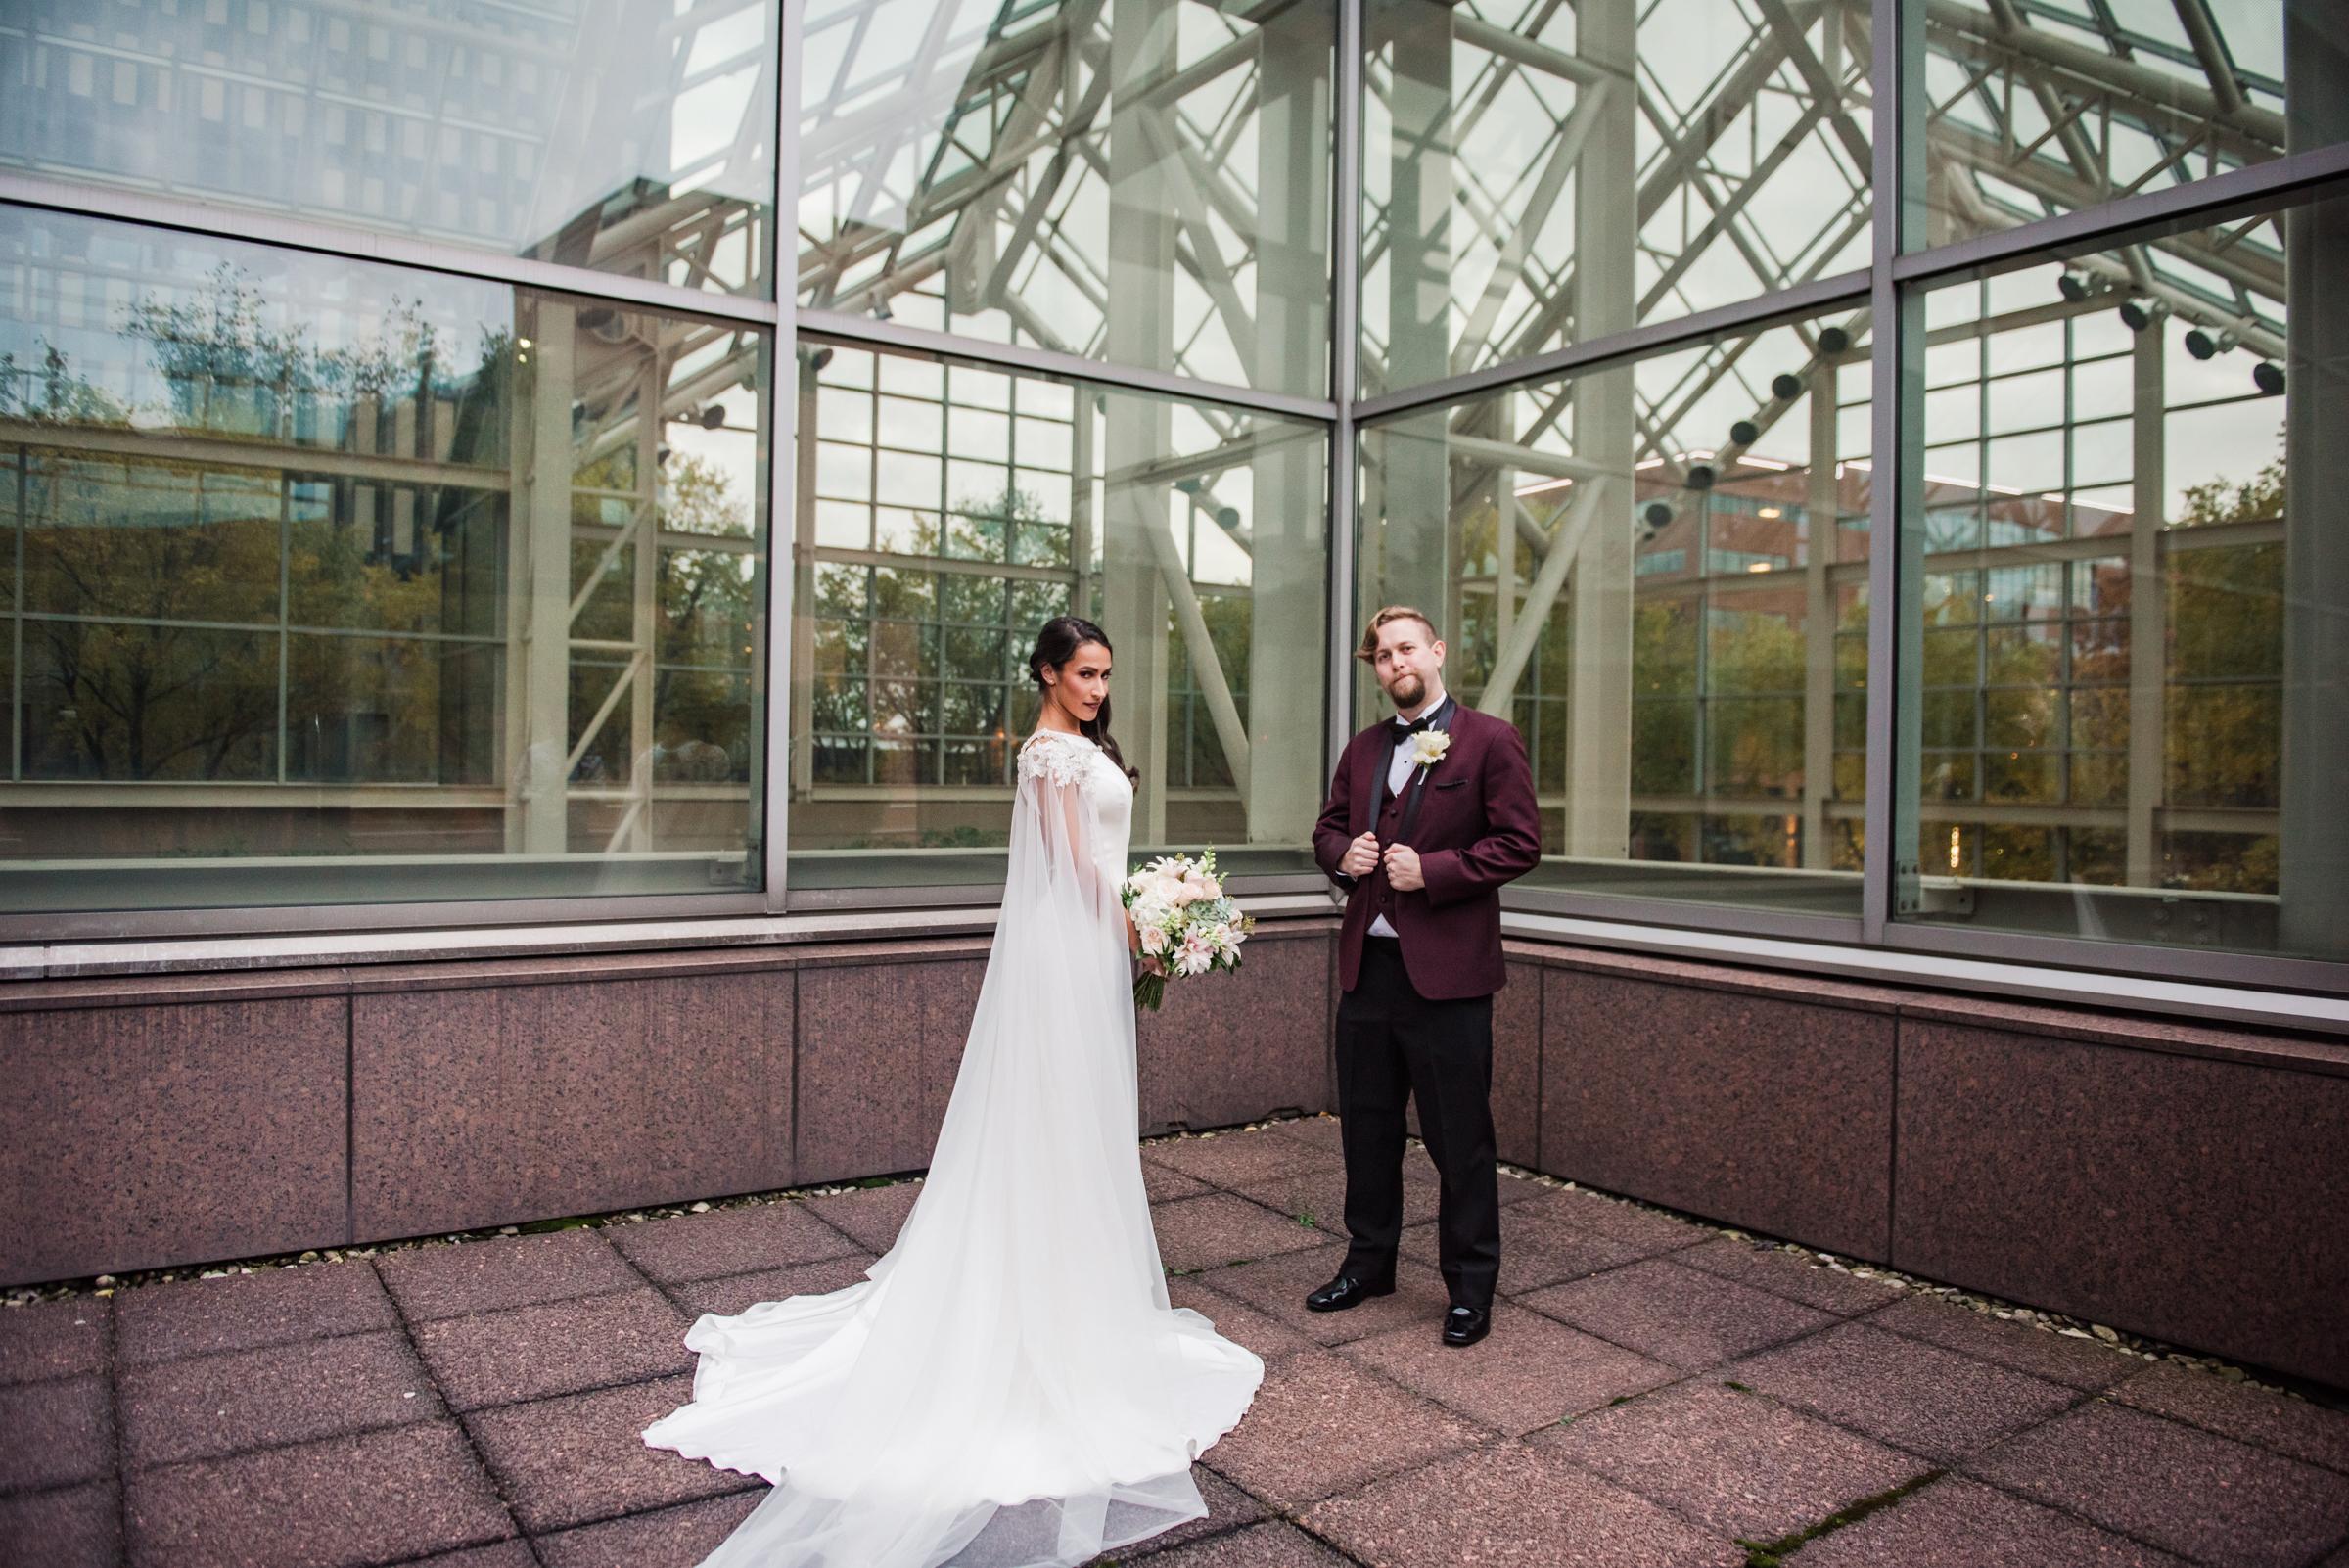 Wintergarden_by_Monroes_Rochester_Wedding_JILL_STUDIO_Rochester_NY_Photographer_174732.jpg